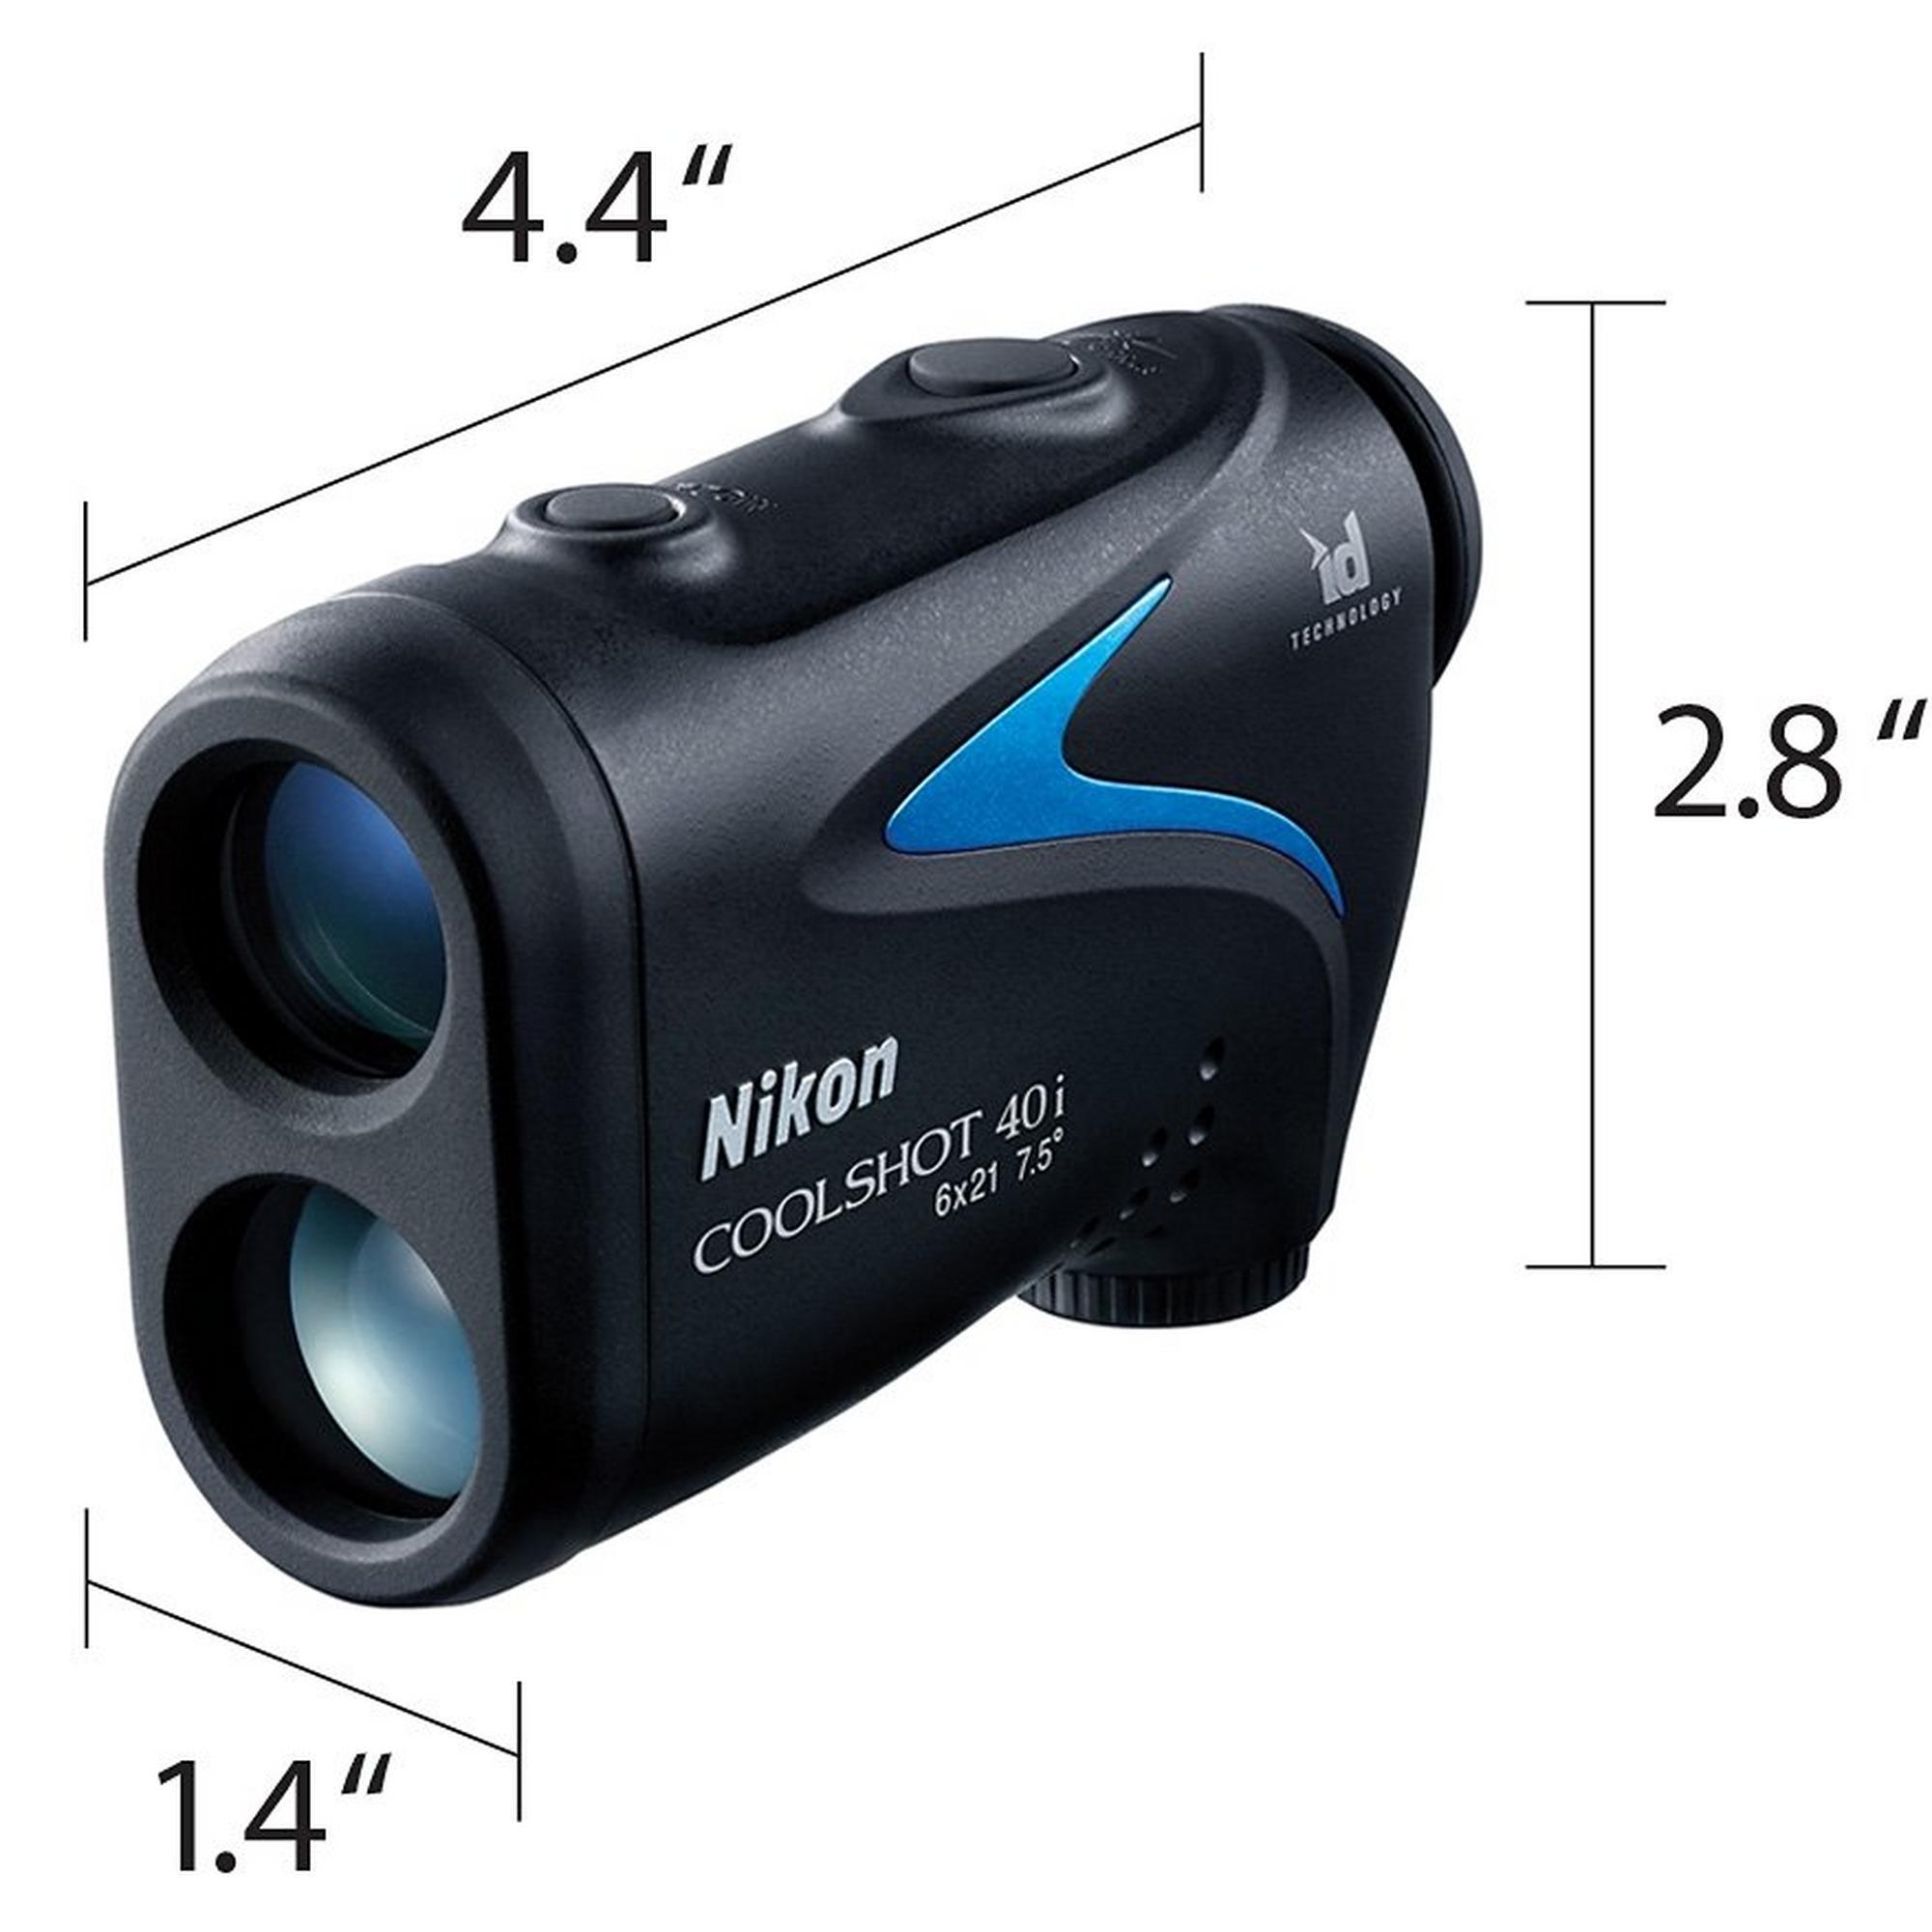 Coolshot 40i Rangefinder